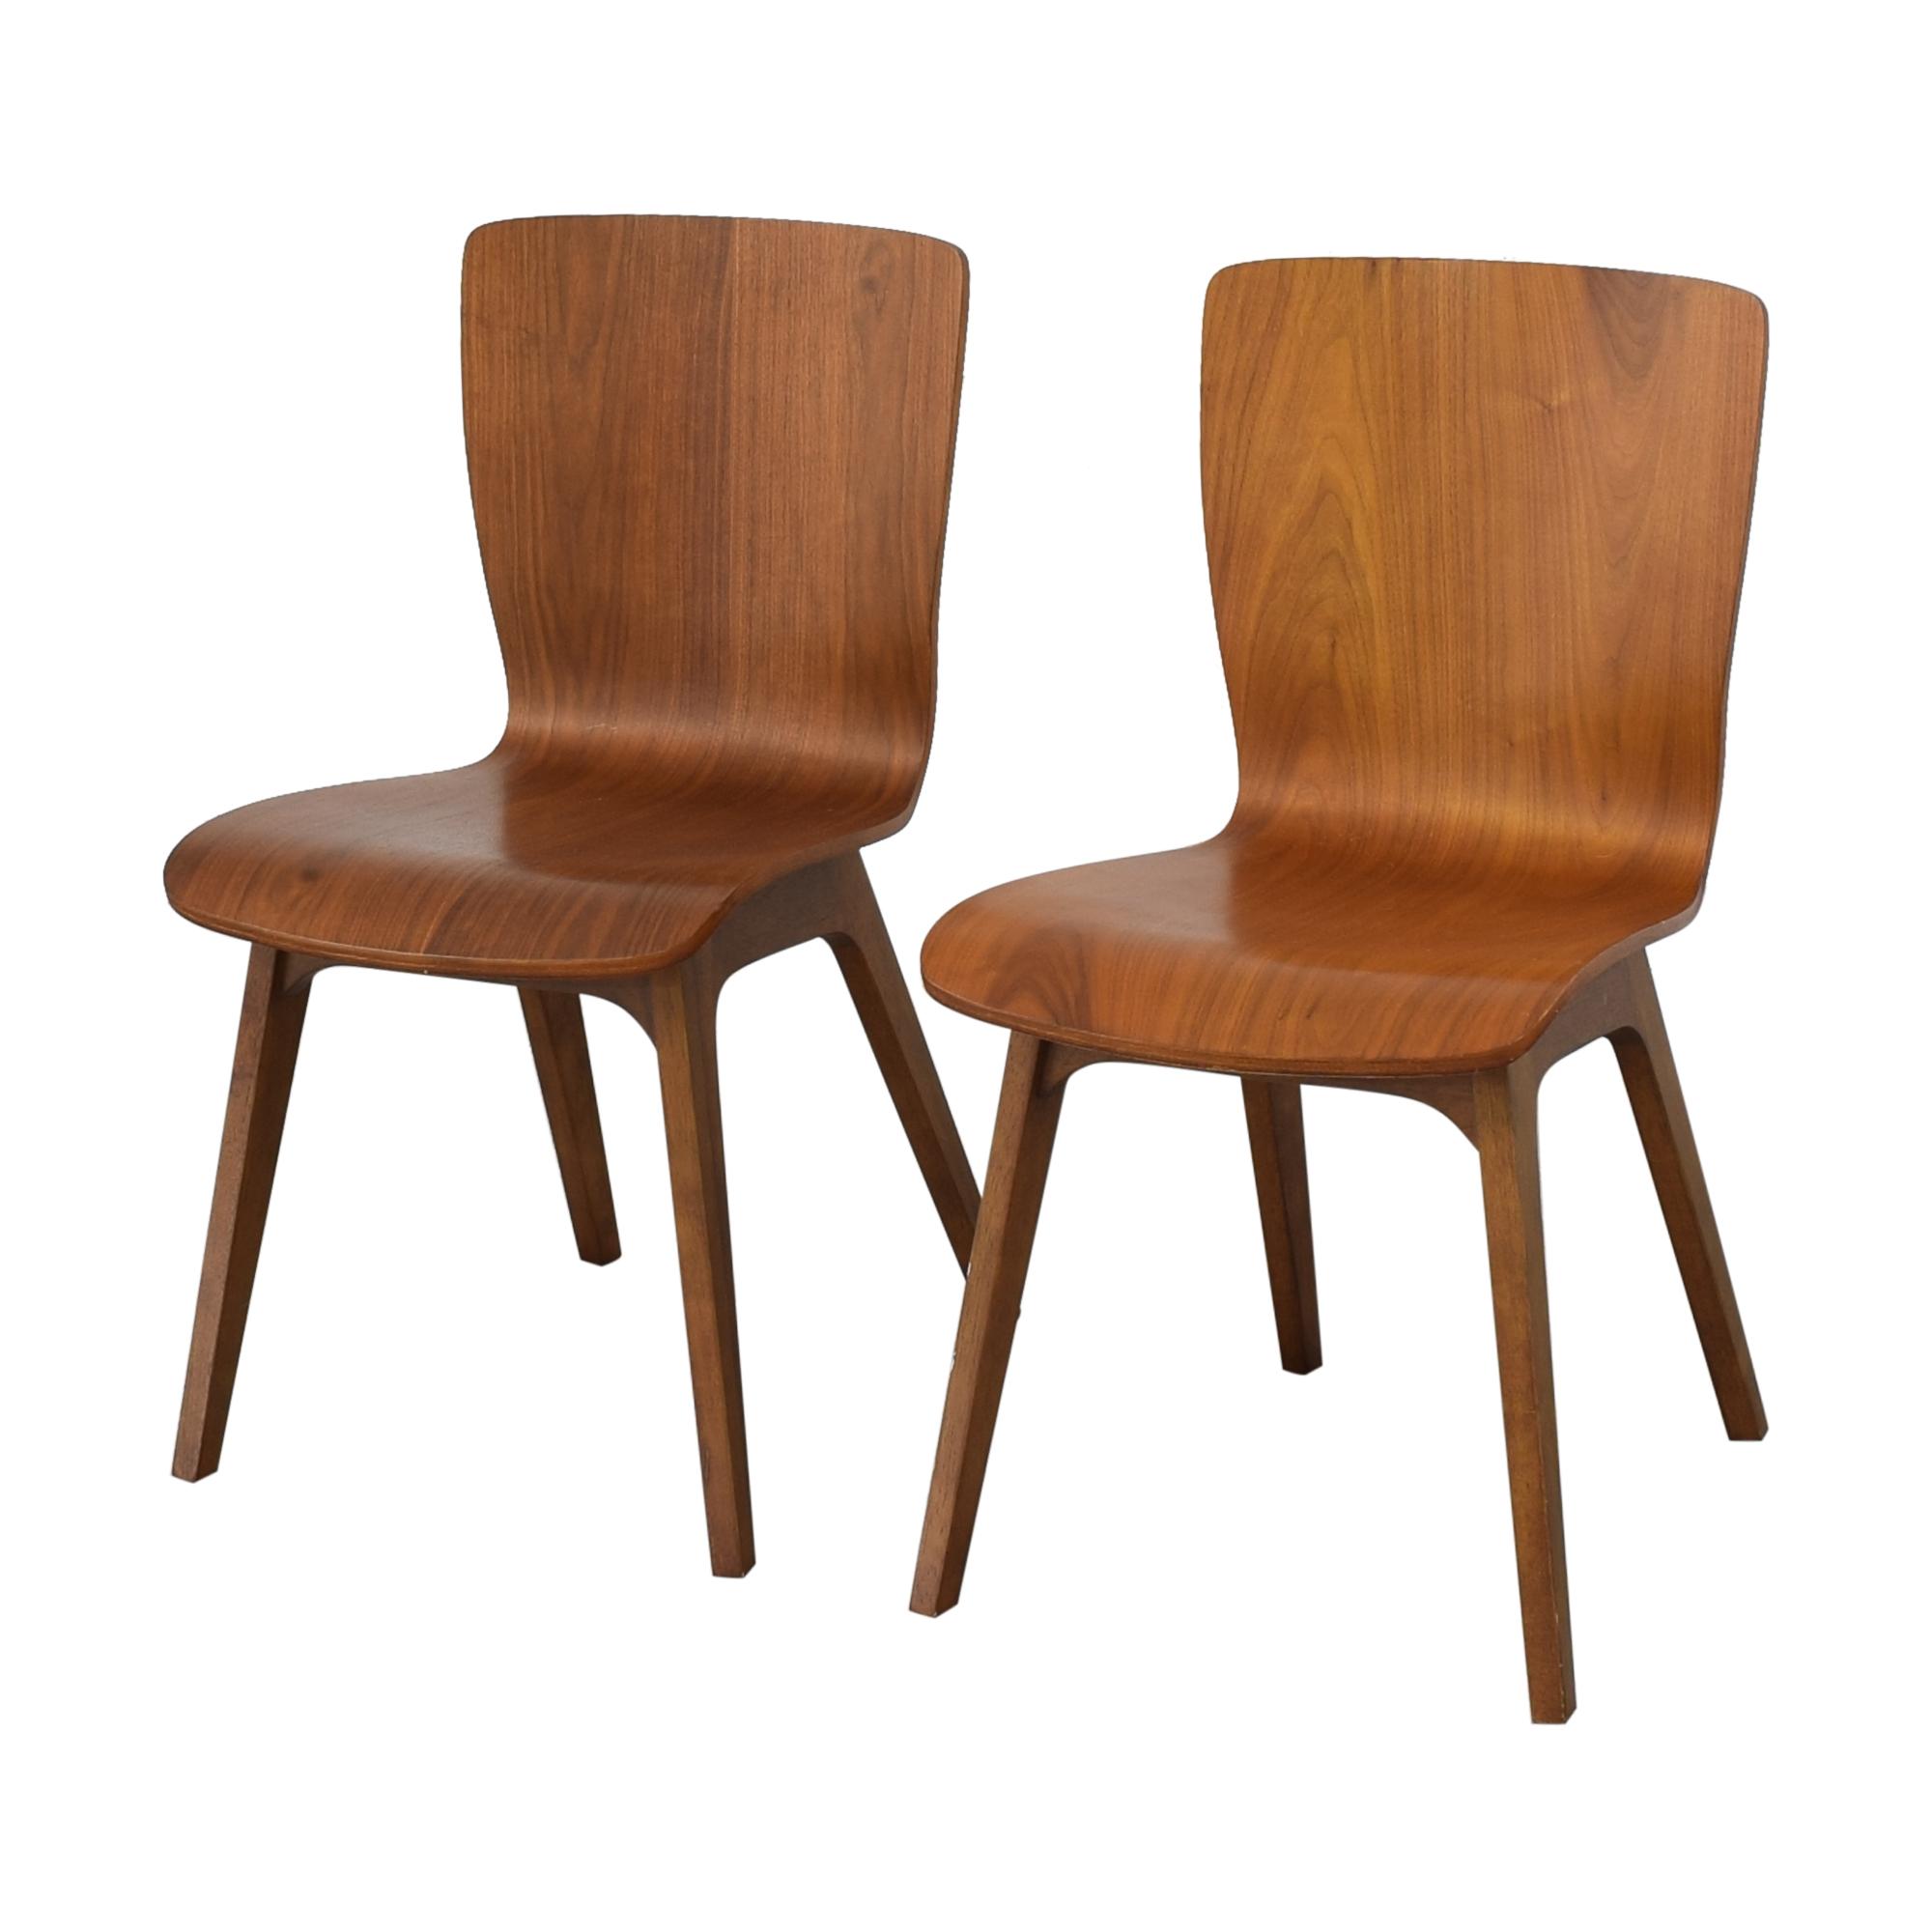 buy West Elm Crest Brentwood Chairs West Elm